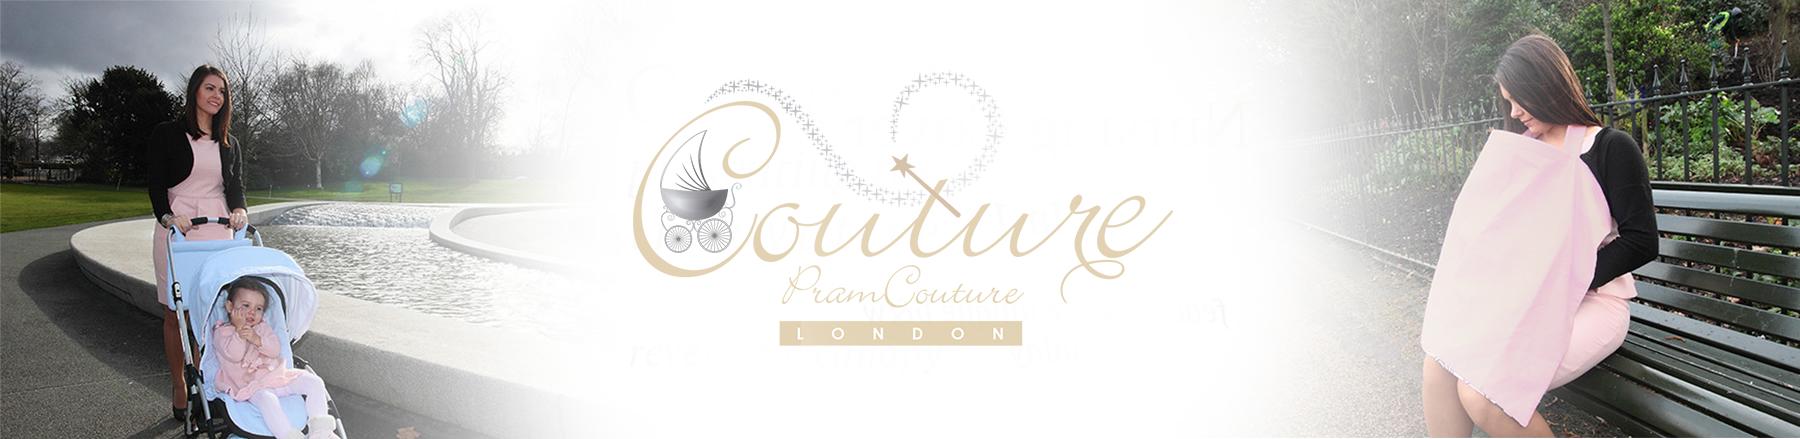 banner-portfolio-Couture